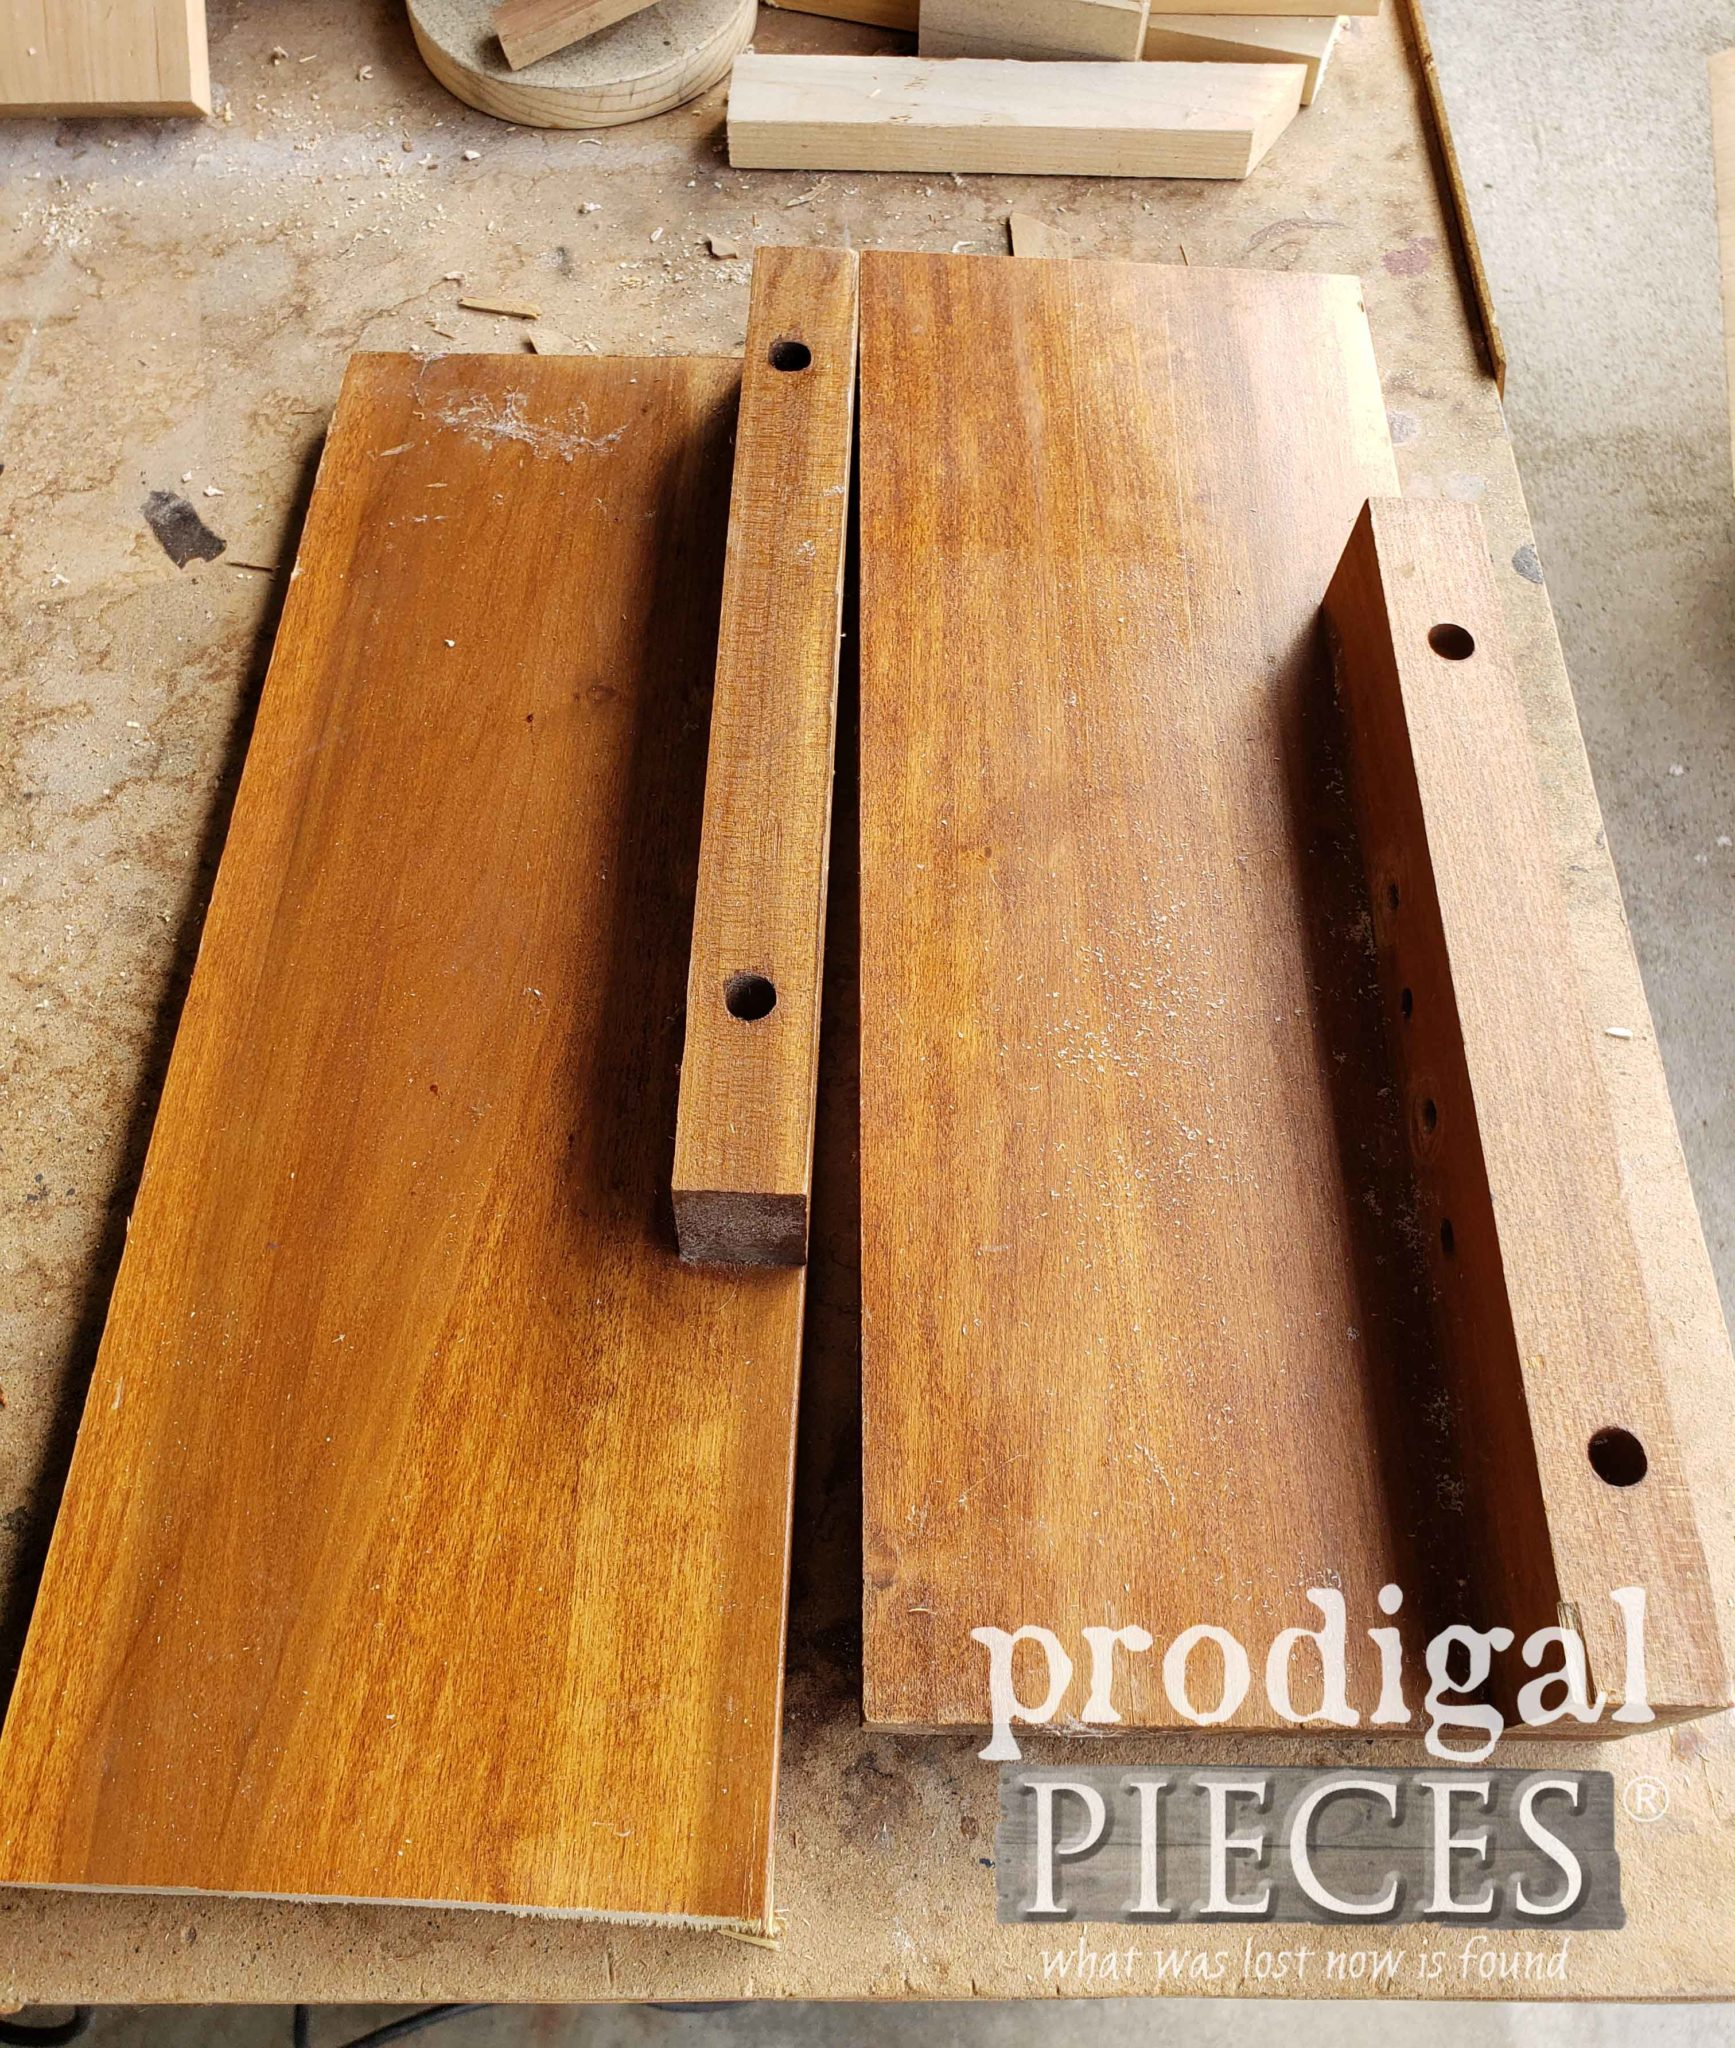 Leftover Bed Pieces for Repurposing   prodigalpieces.com